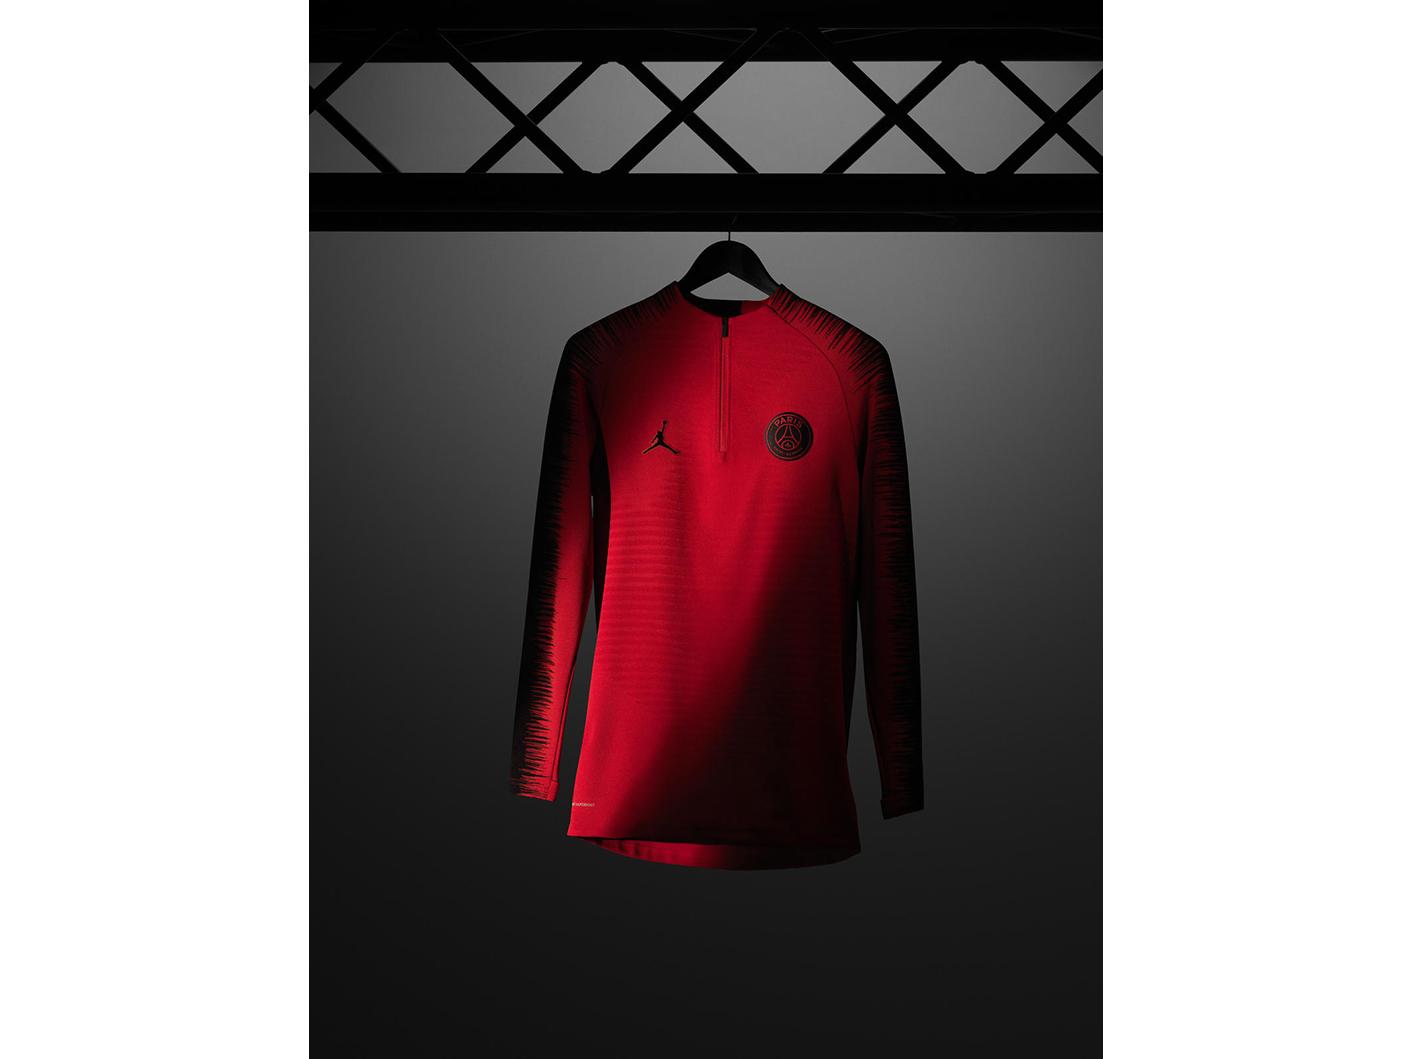 Jordan_Brand__Paris_Saint-Germain_as_its_First-Ever_Football_Club_Soccer_20_81727